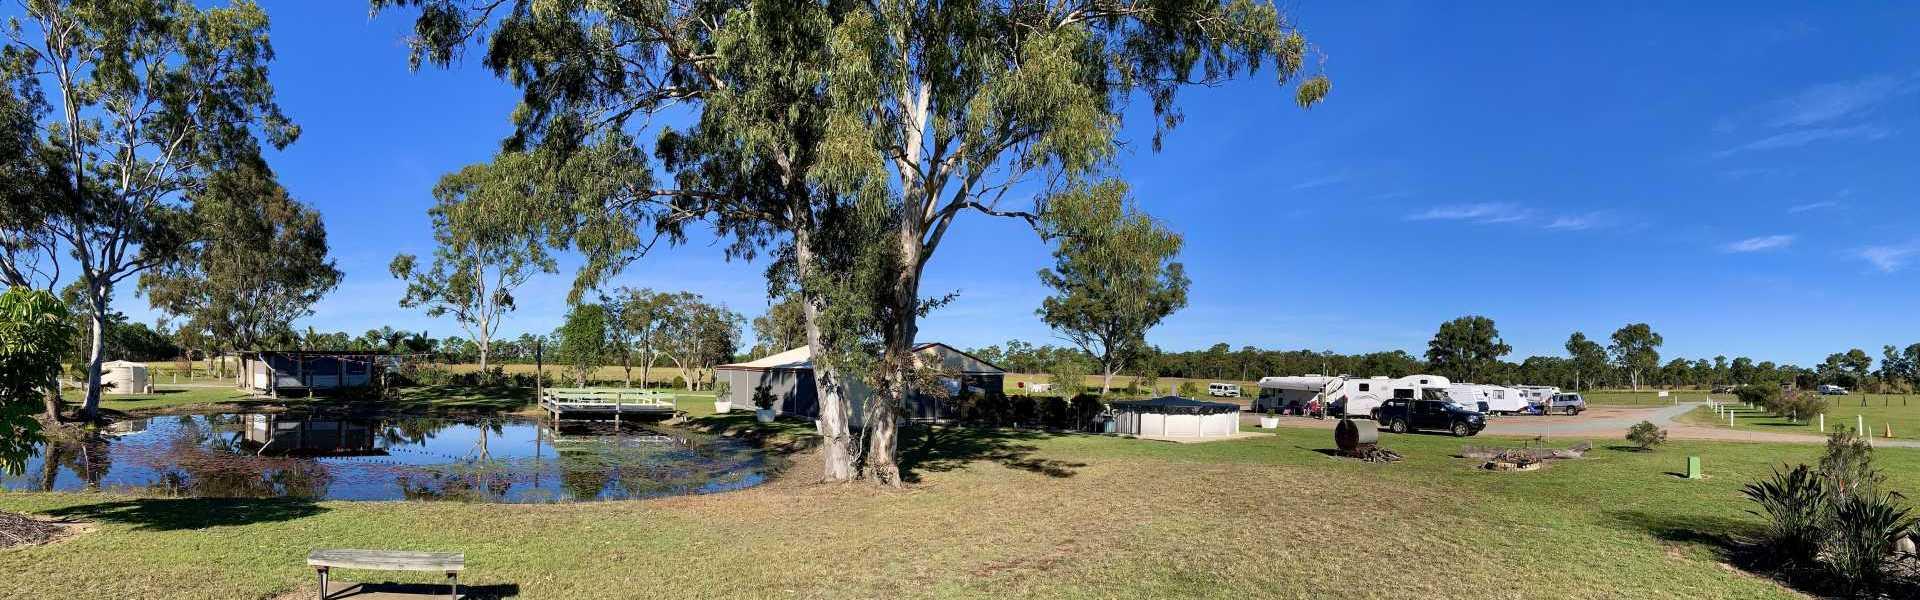 Cheery Nomad RV Park Farmstay Lake 2